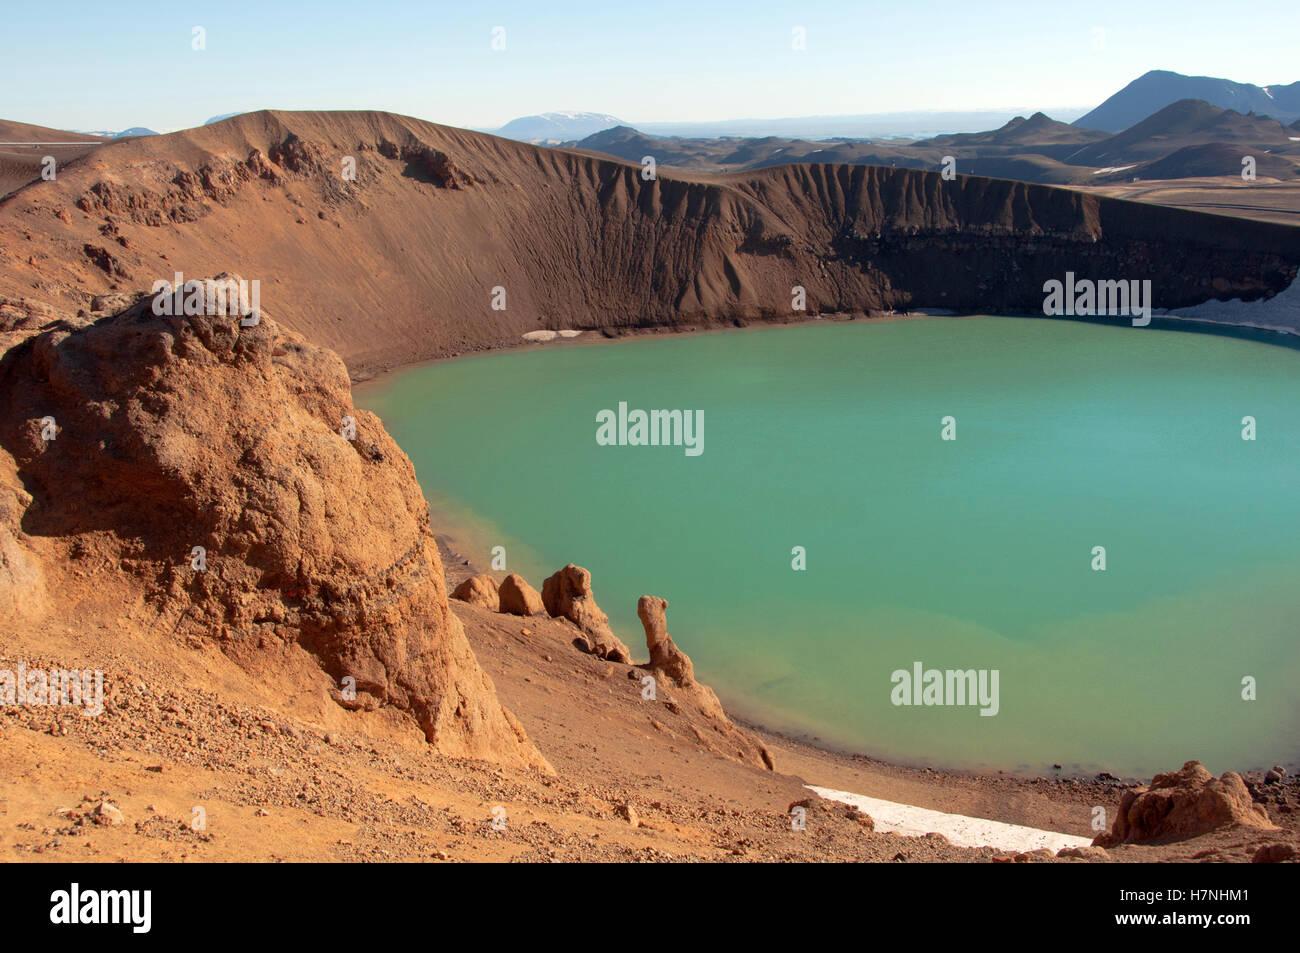 The Stora Viti Krater by Mount Krafla Iceland - Stock Image